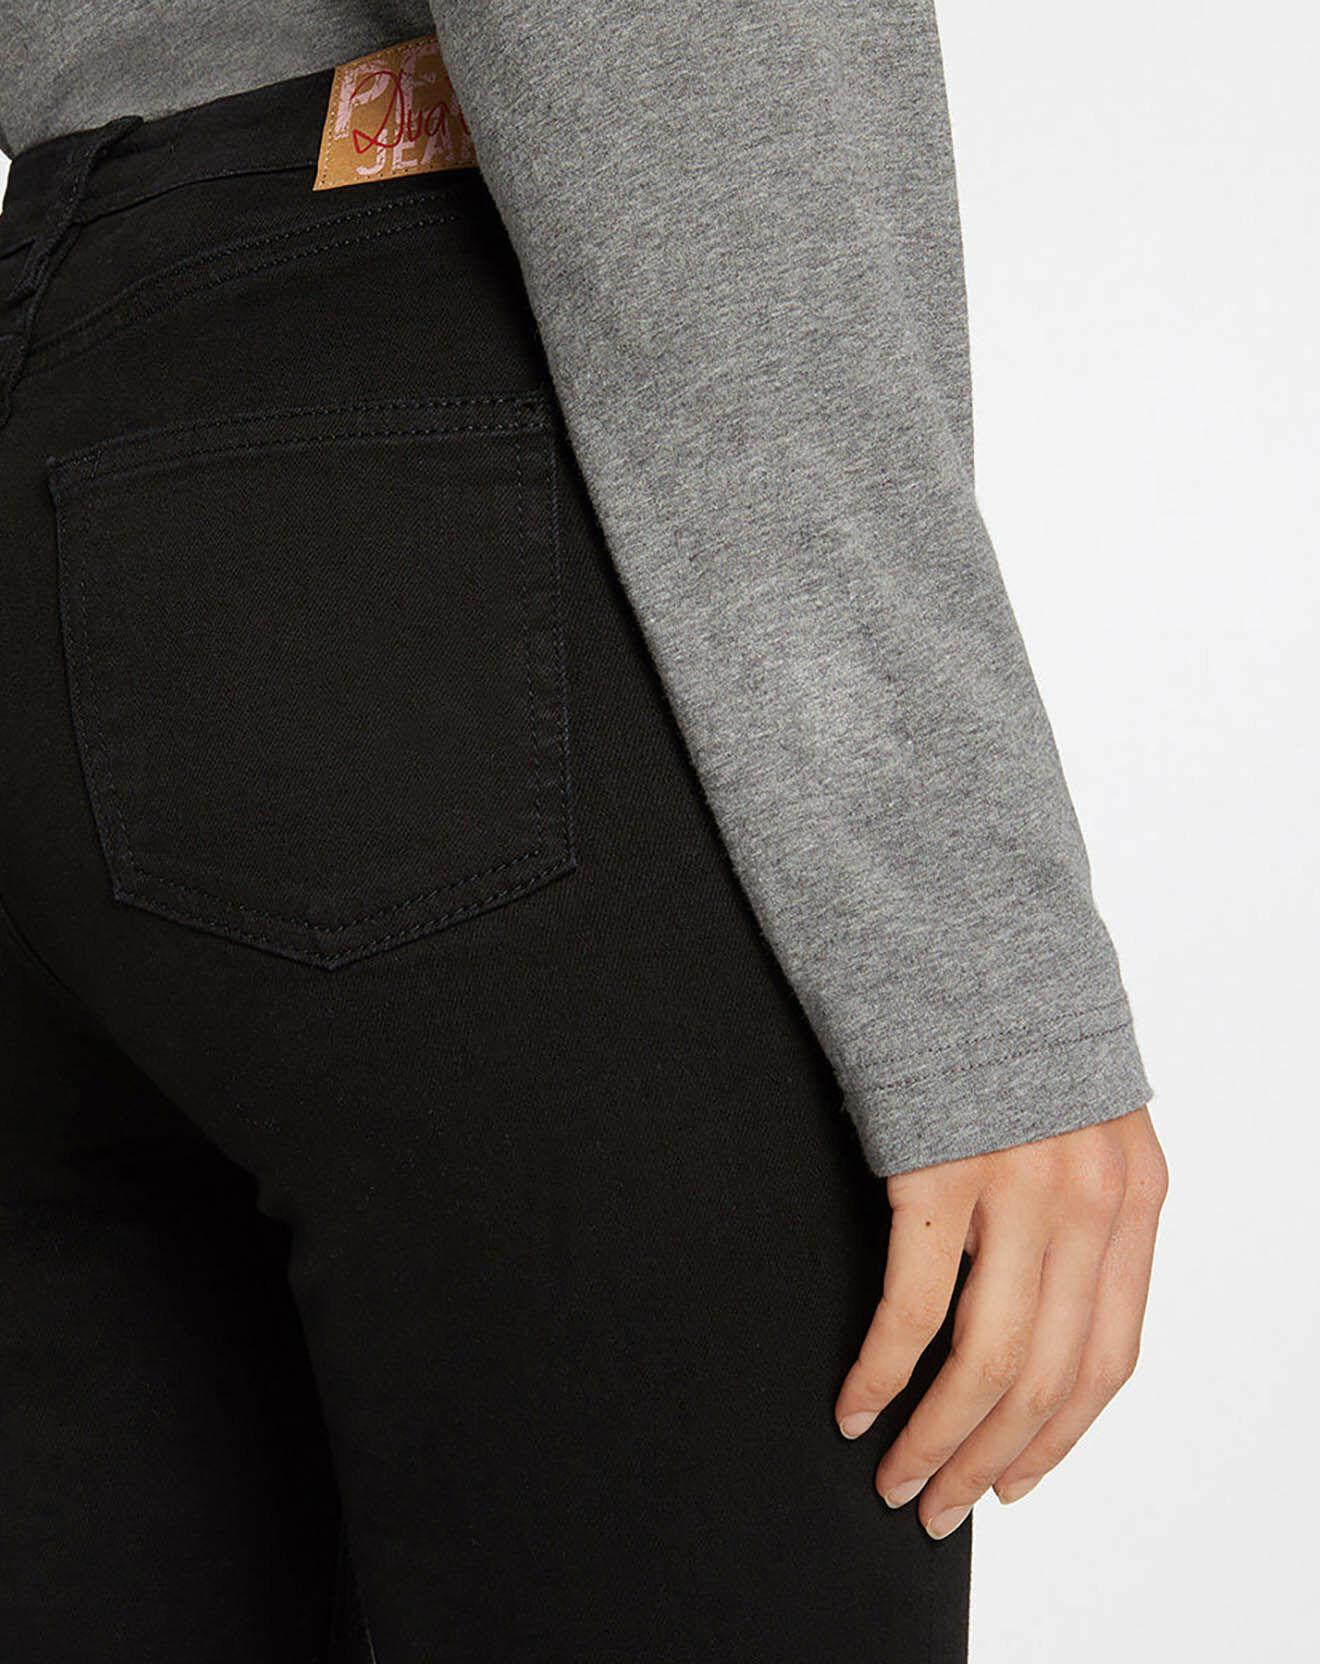 Jean Flare Taille haute noir - Pepe Jeans - Modalova